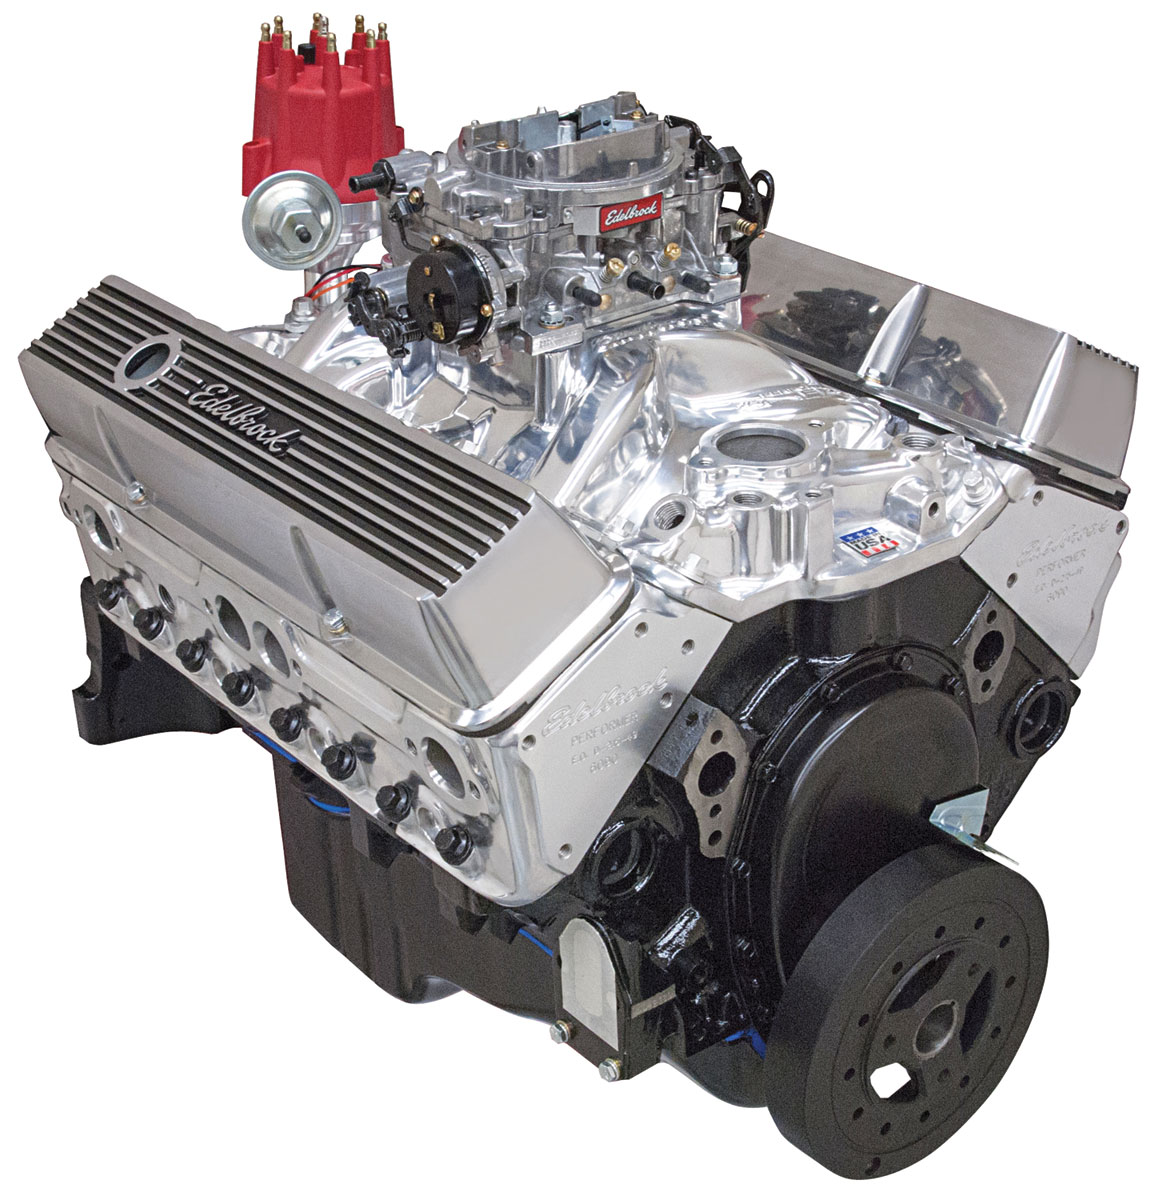 Crate Engine, Performer, Edelbrock, Chevrolet 350 Air-Gap, w/o Water Pump, Satin